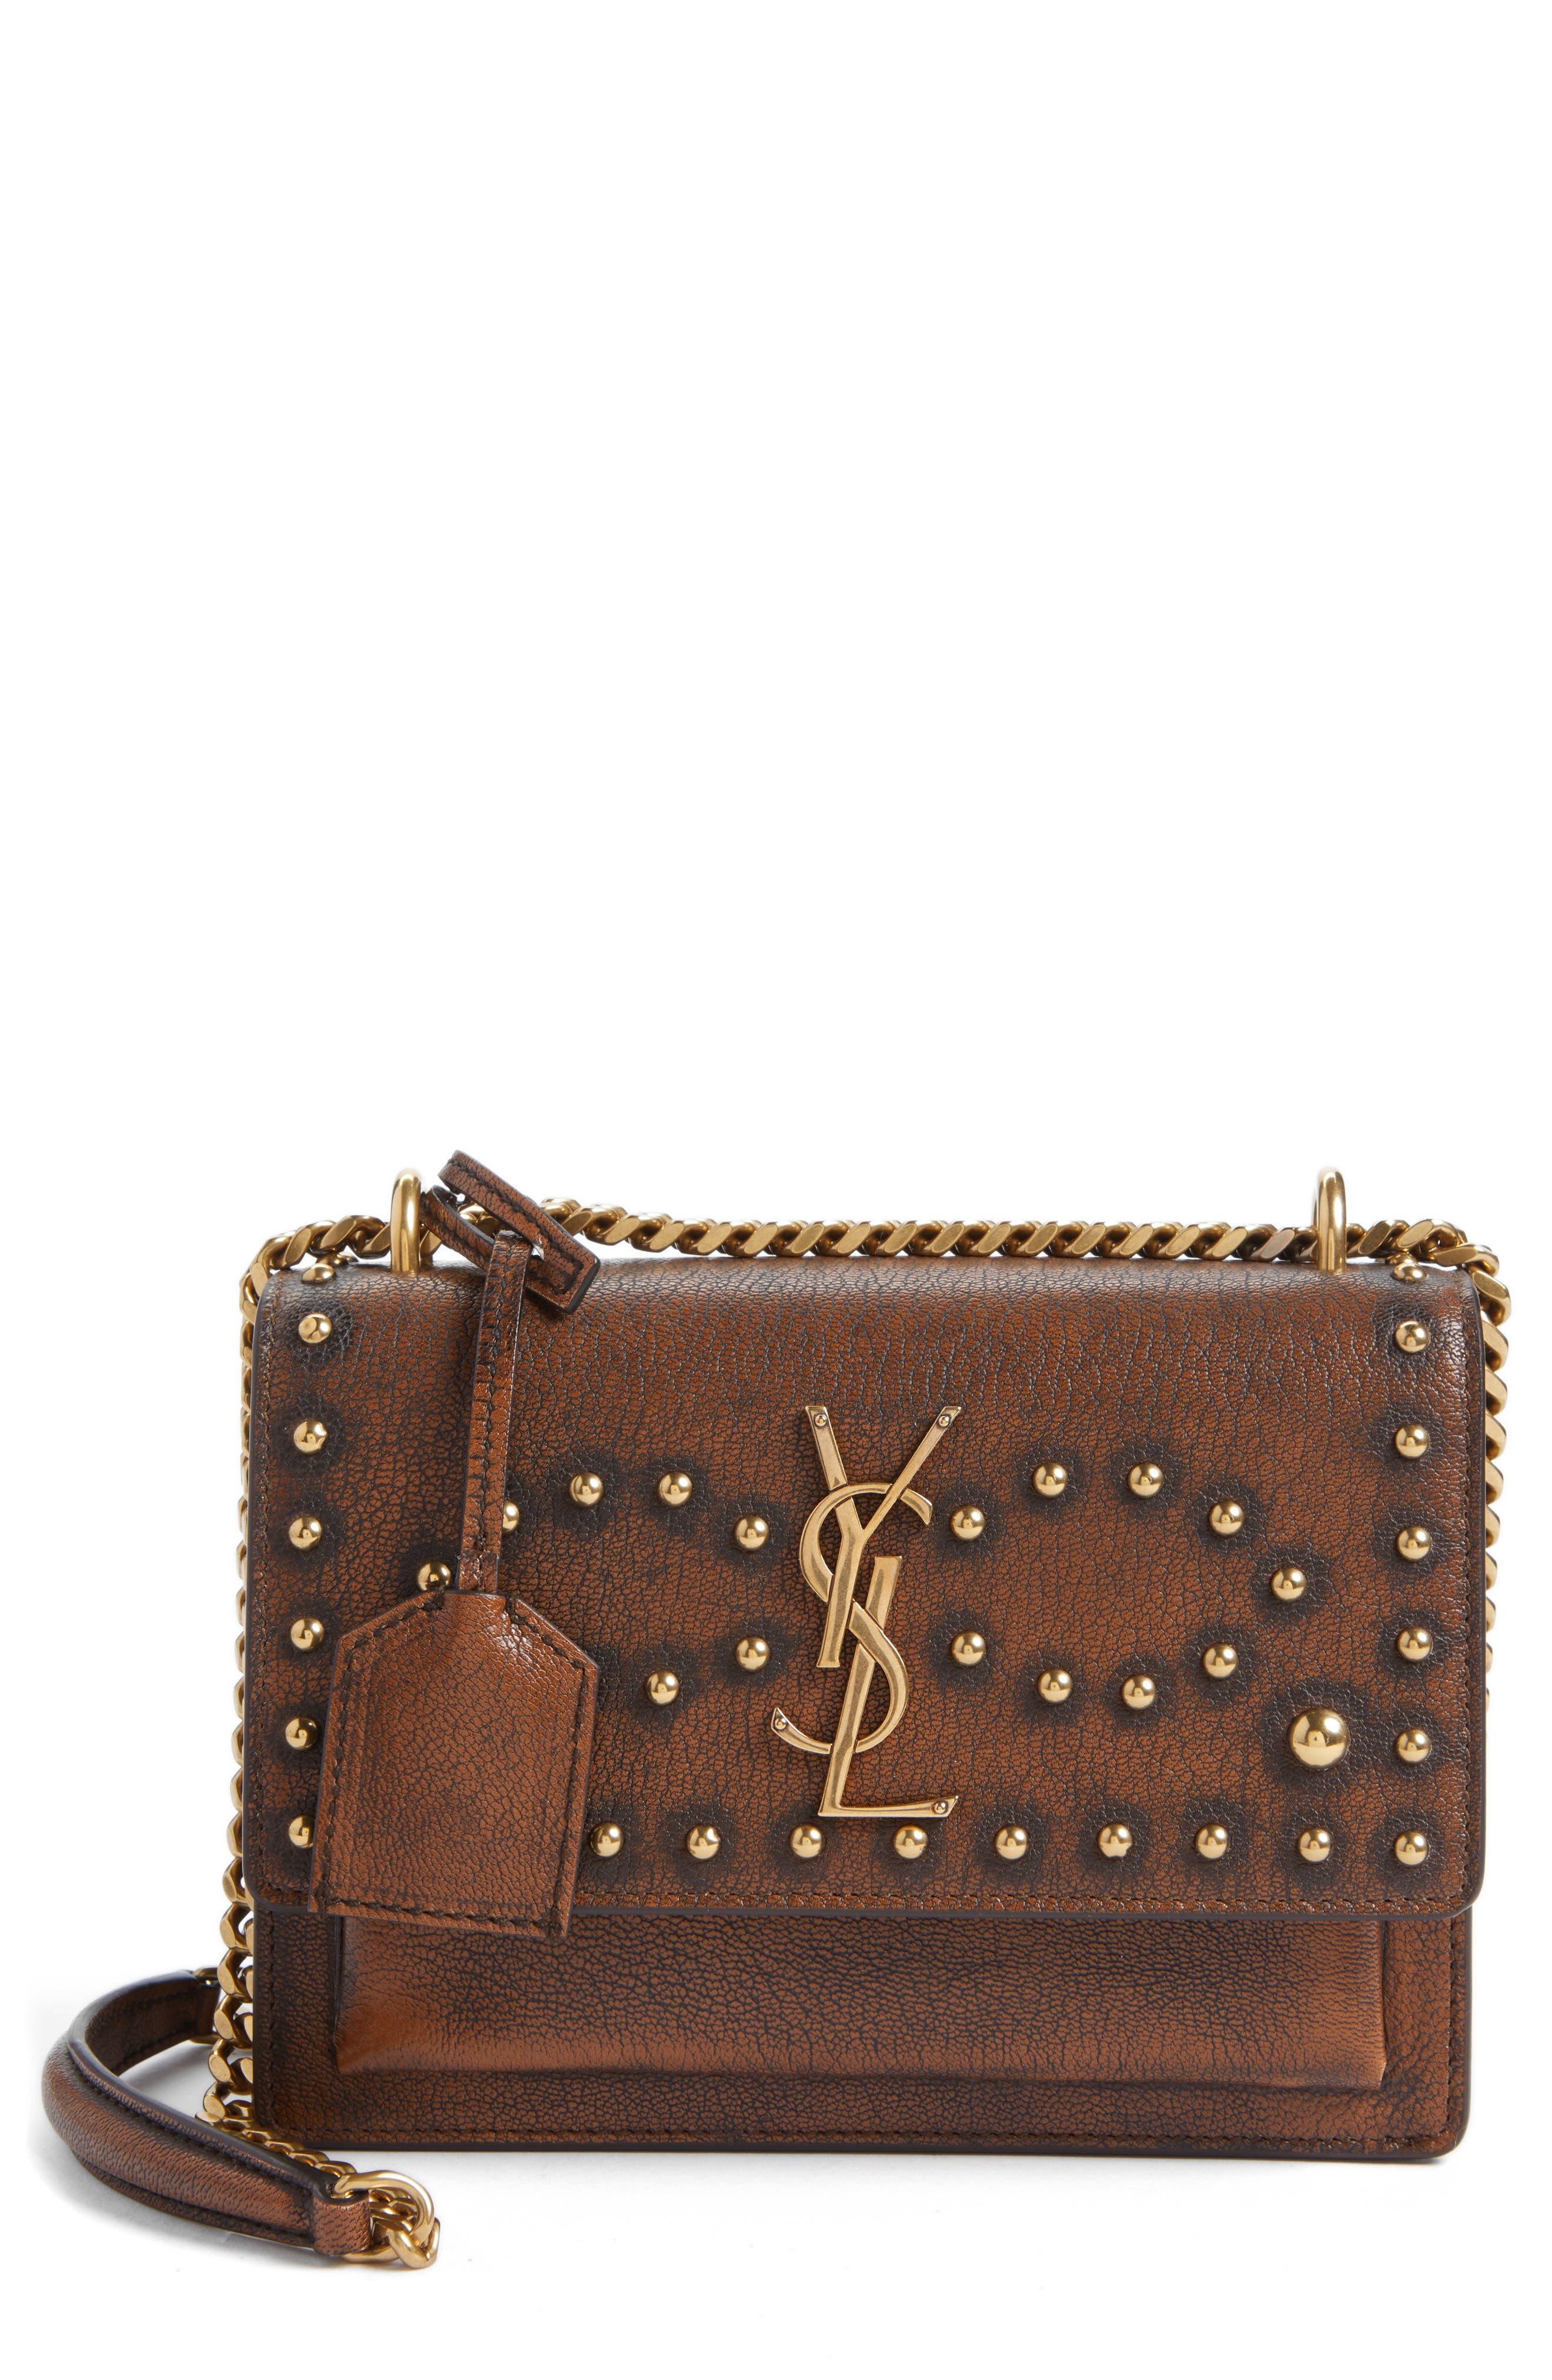 Small Sunset Studded Vintage Leather Shoulder Bag,                             Main thumbnail 1, color,                             979